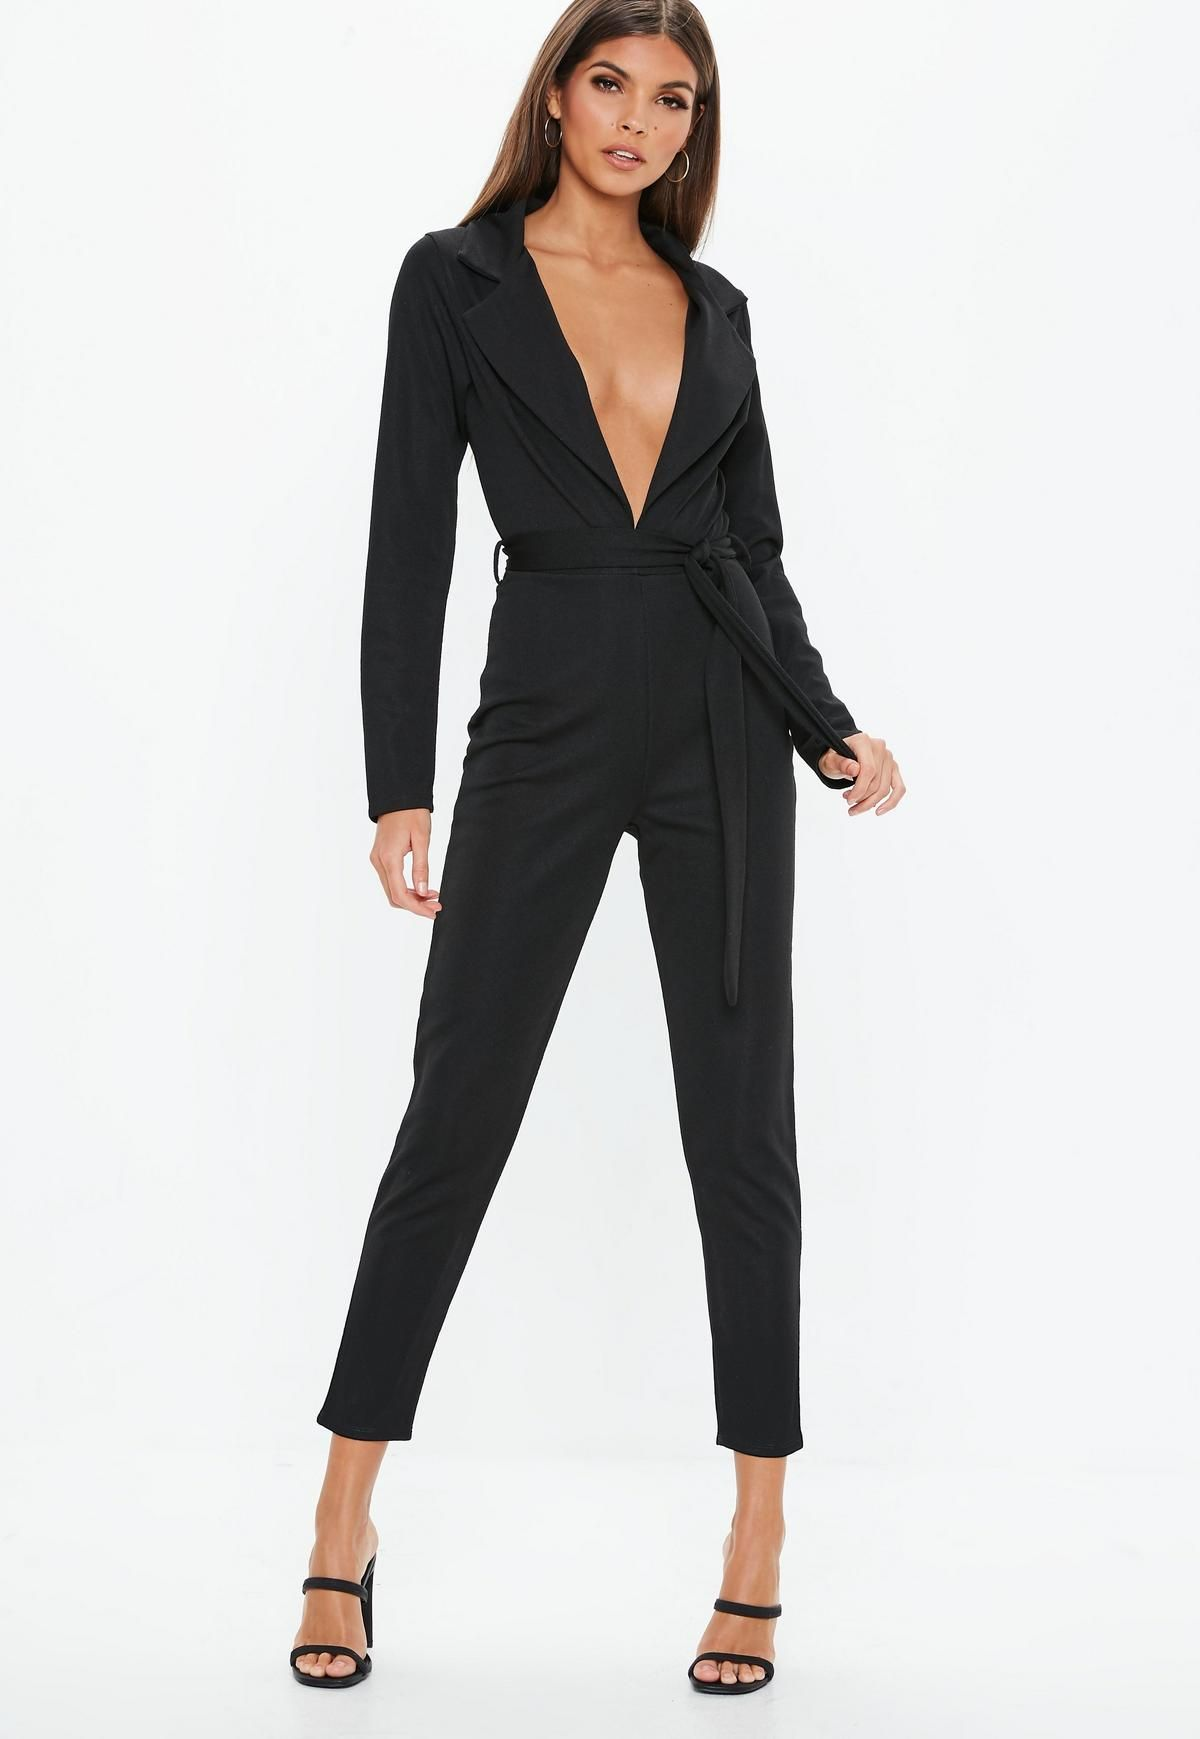 568145ed53 Black Tie Waist Blazer Jumpsuit